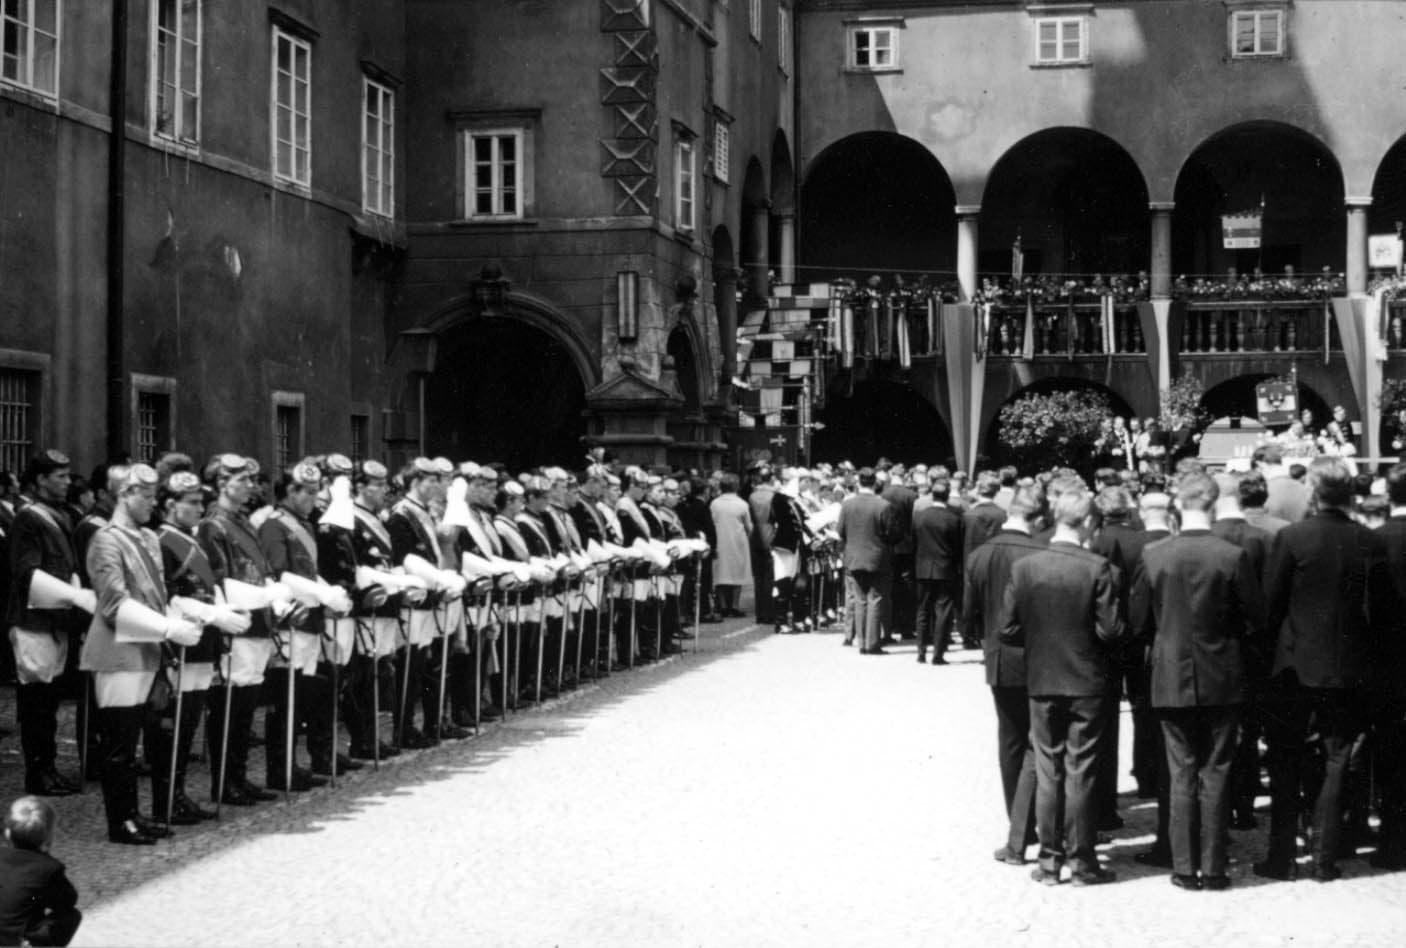 1966 Pennälertag Chargierte